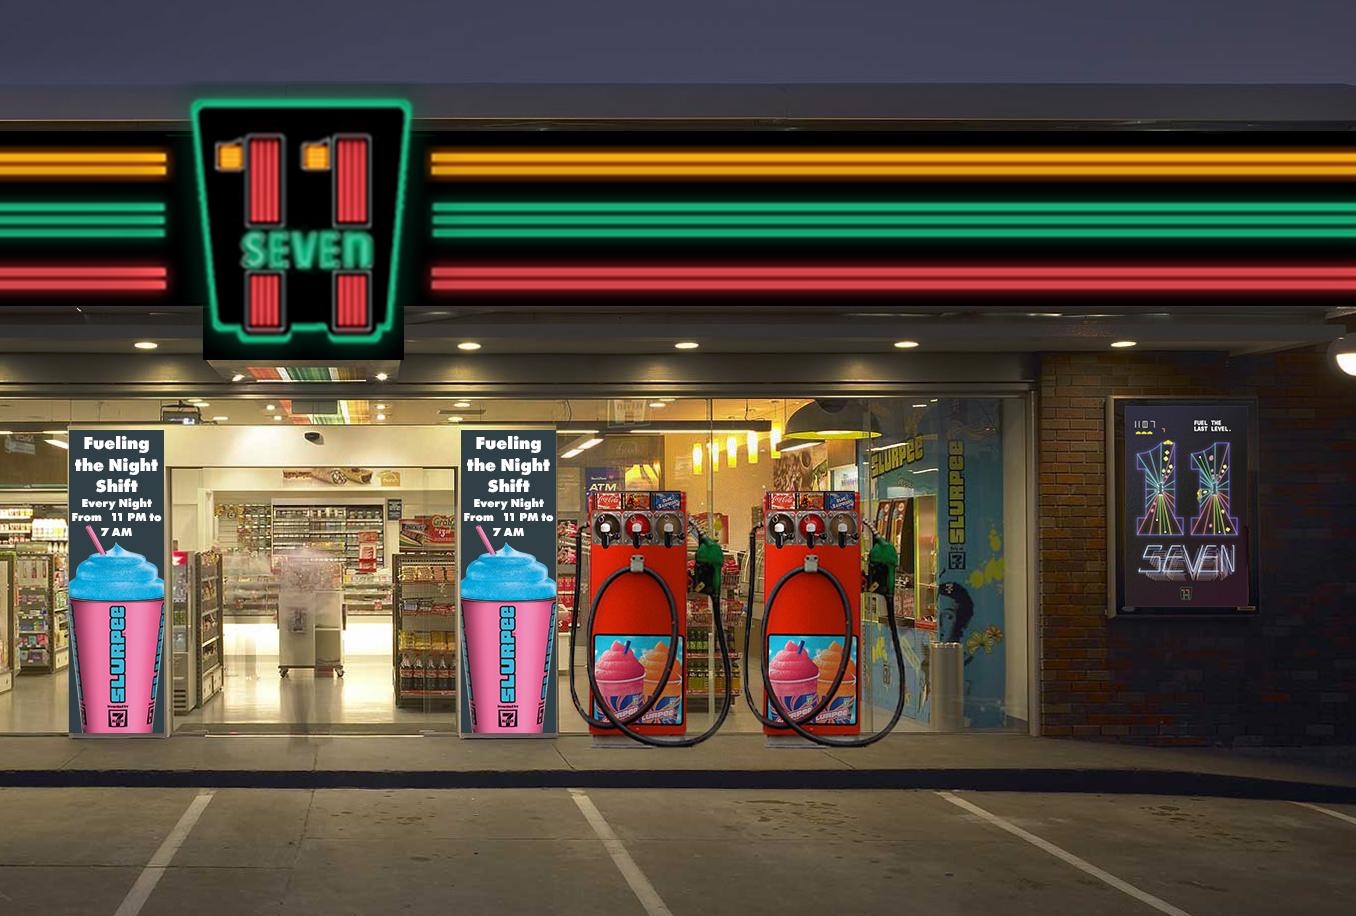 11-seven gas pumps.jpg